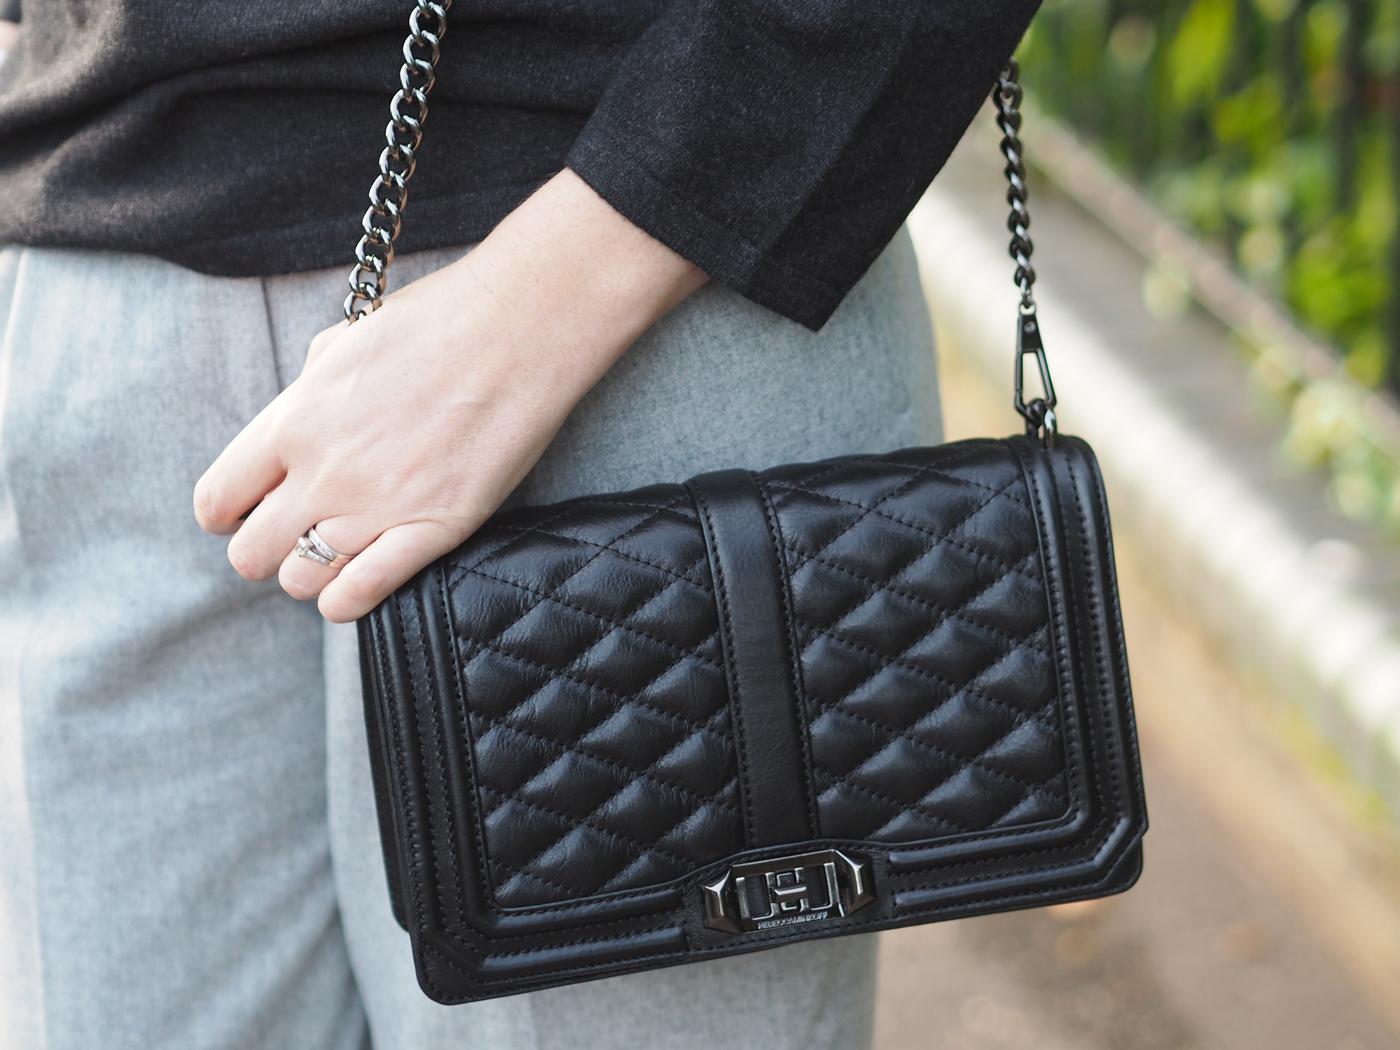 rebecca minkoff Love rectangle satchel bag 袋的圖片搜尋結果